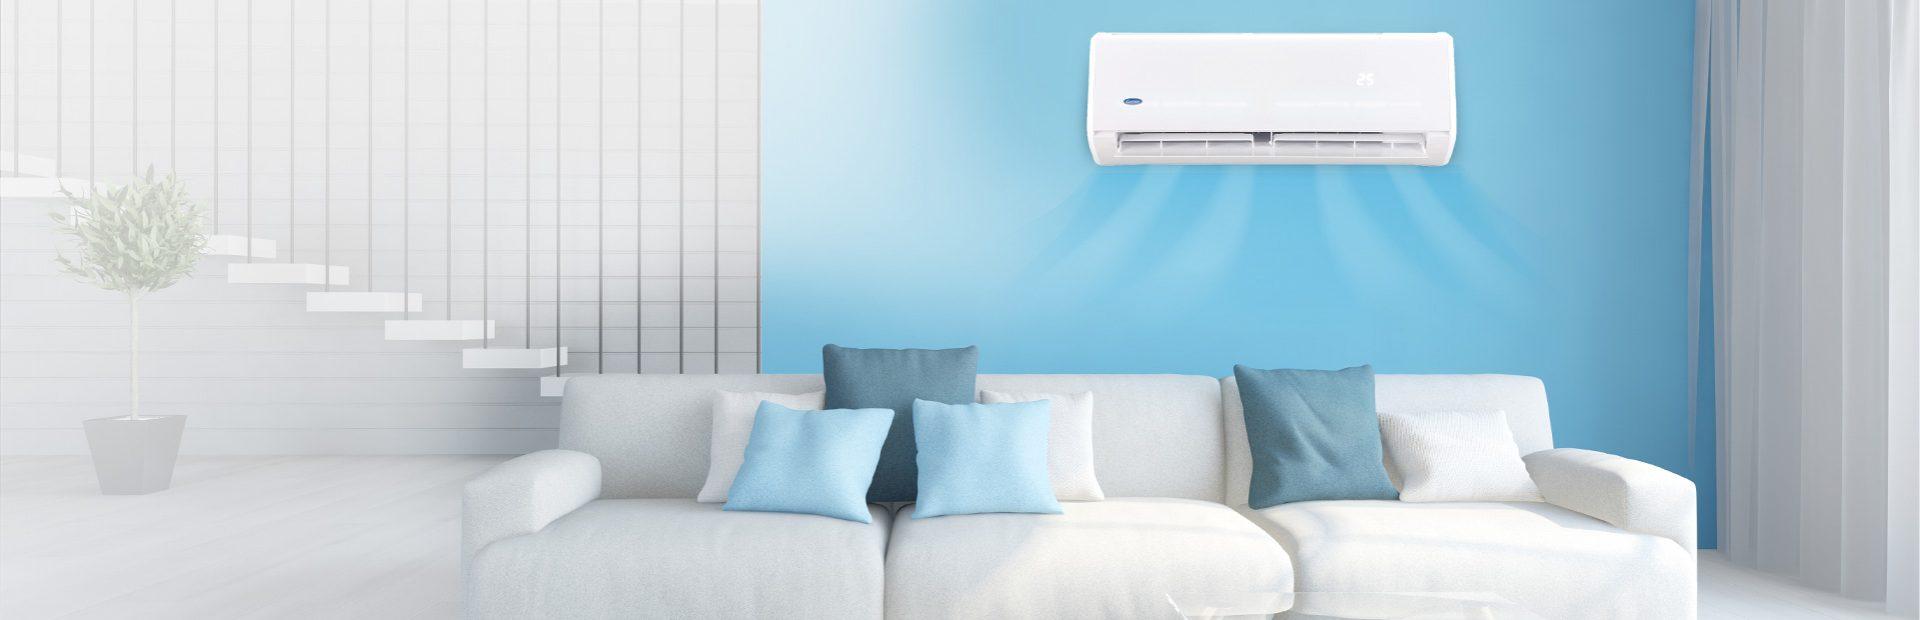 lg air conditioner helpline